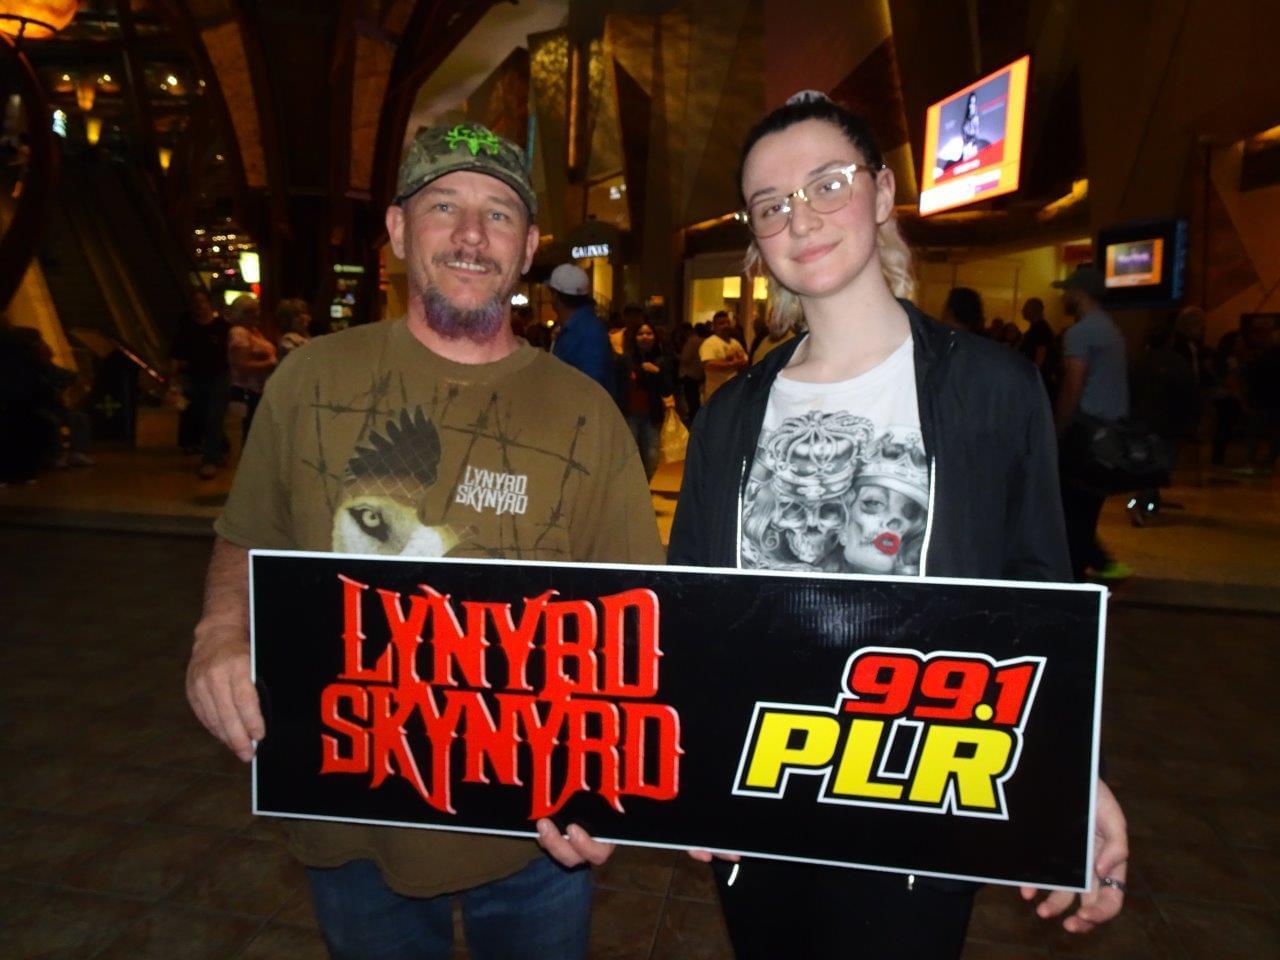 Lynyrd Skynyrd at Mohegan Sun 5/24/19